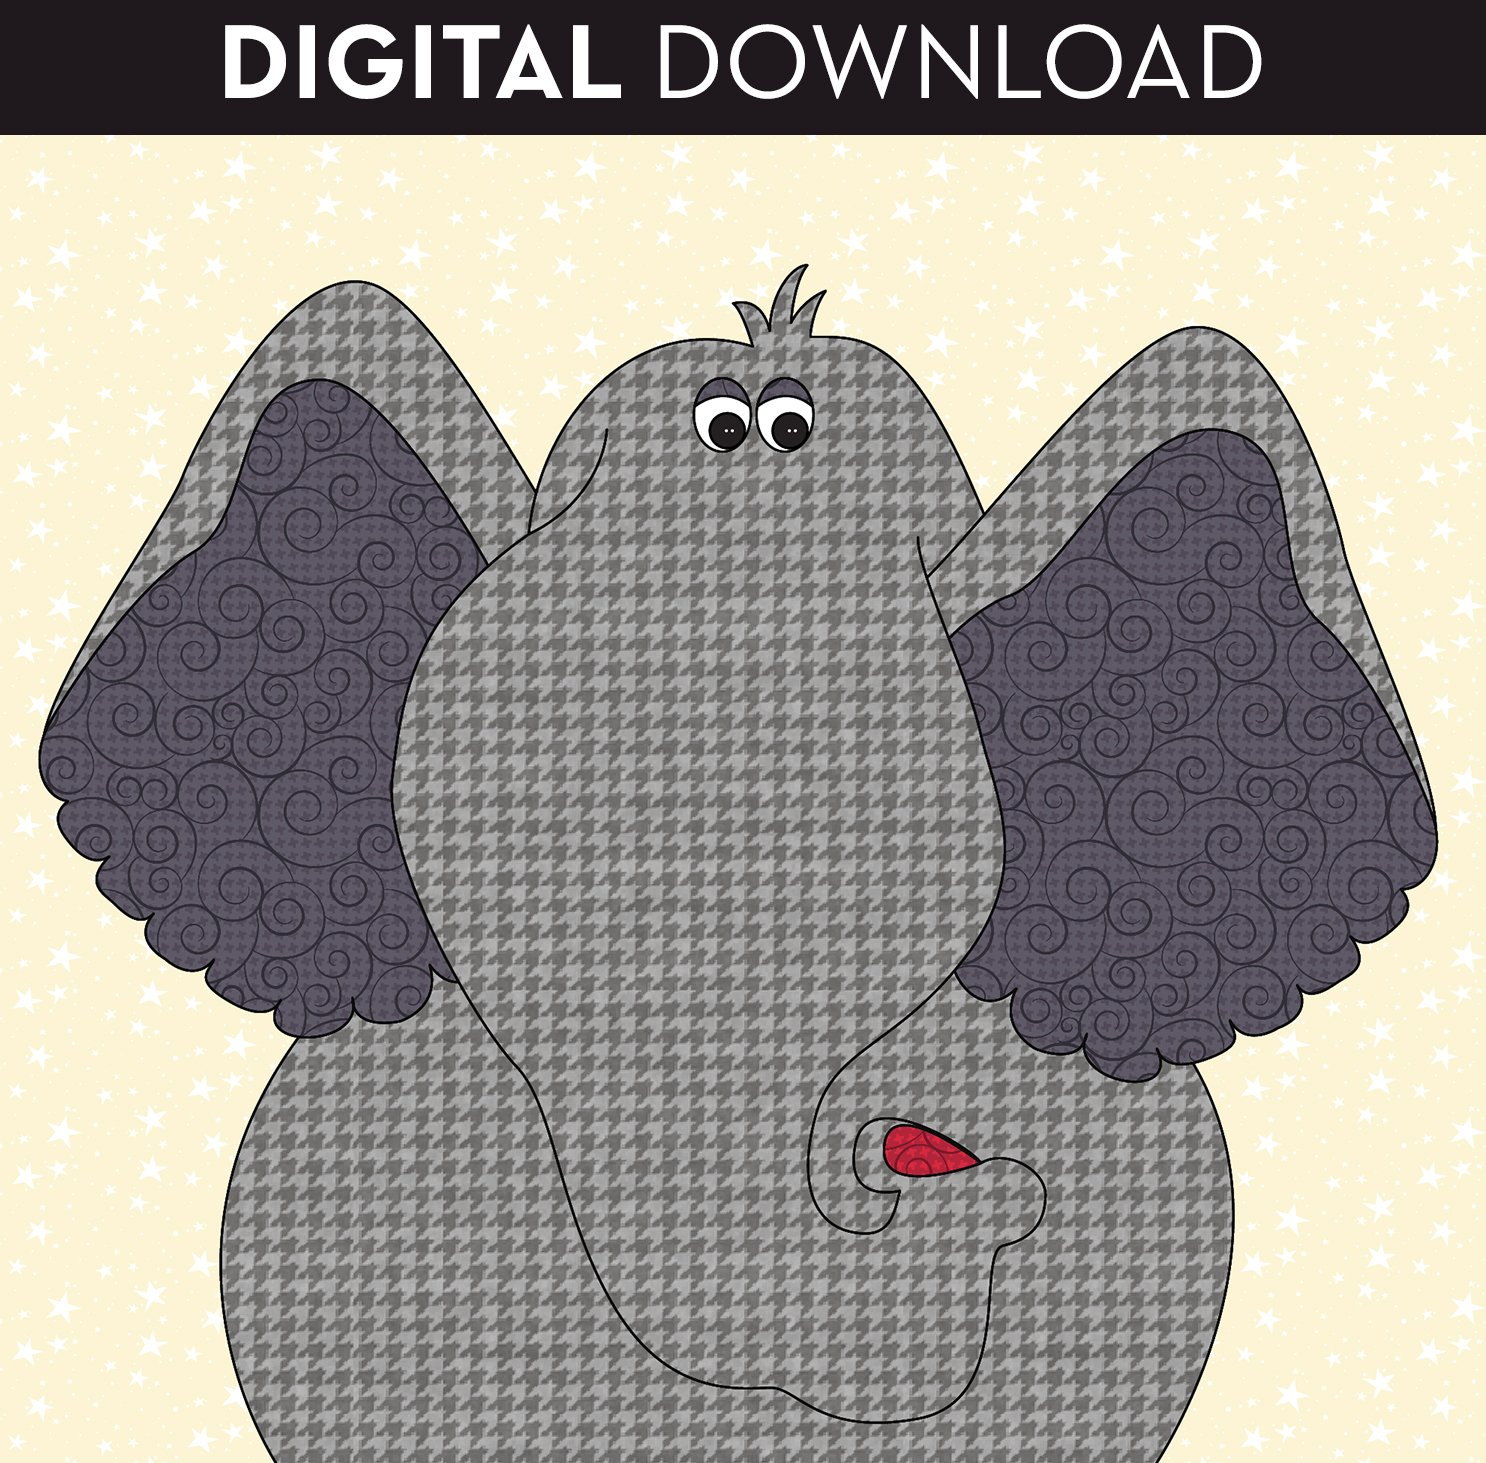 Elephant - Download